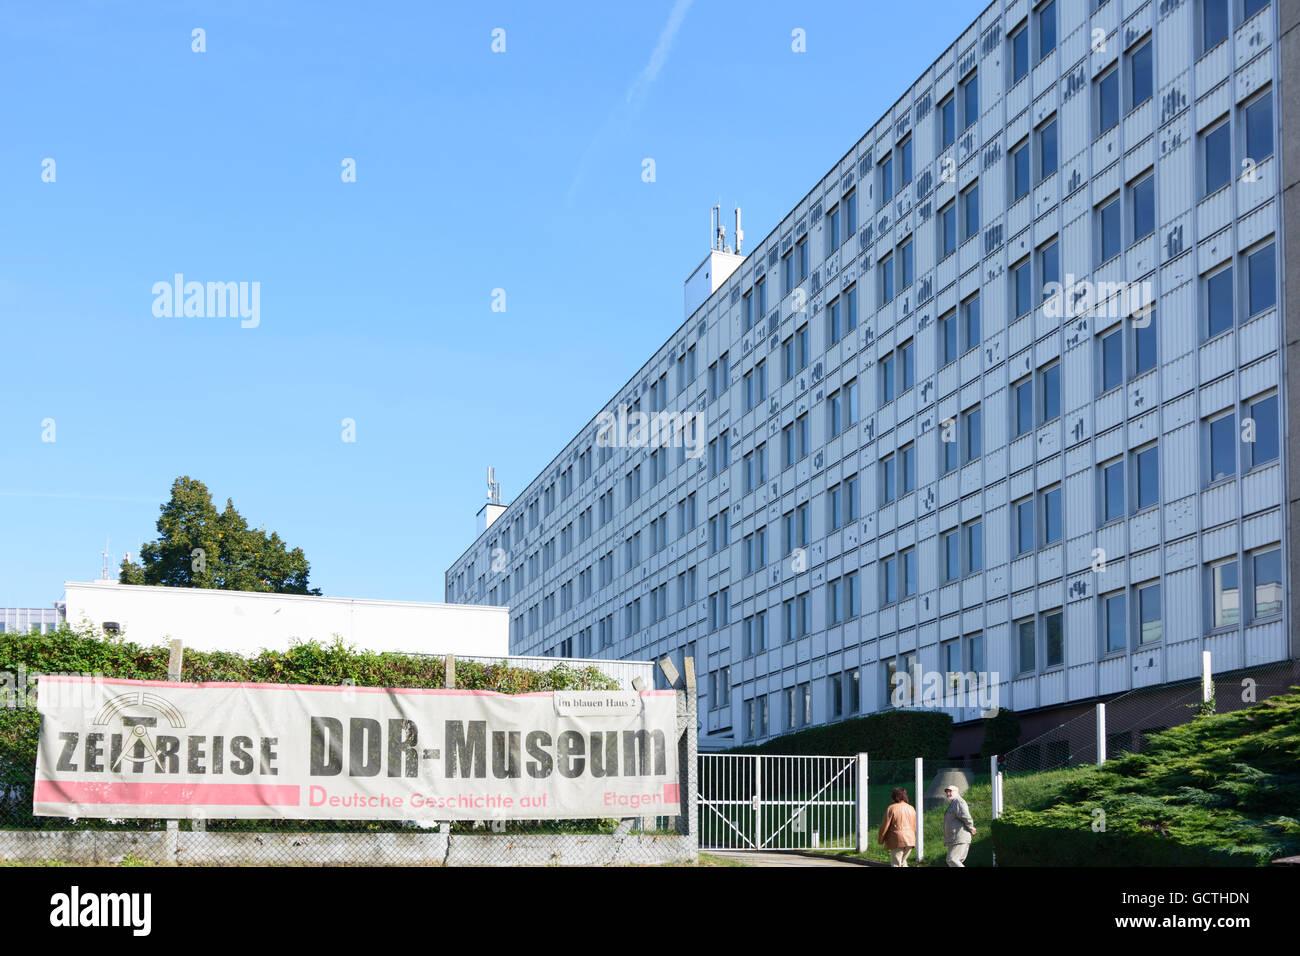 Radebeul GDR Museum Germany Sachsen, Saxony - Stock Image